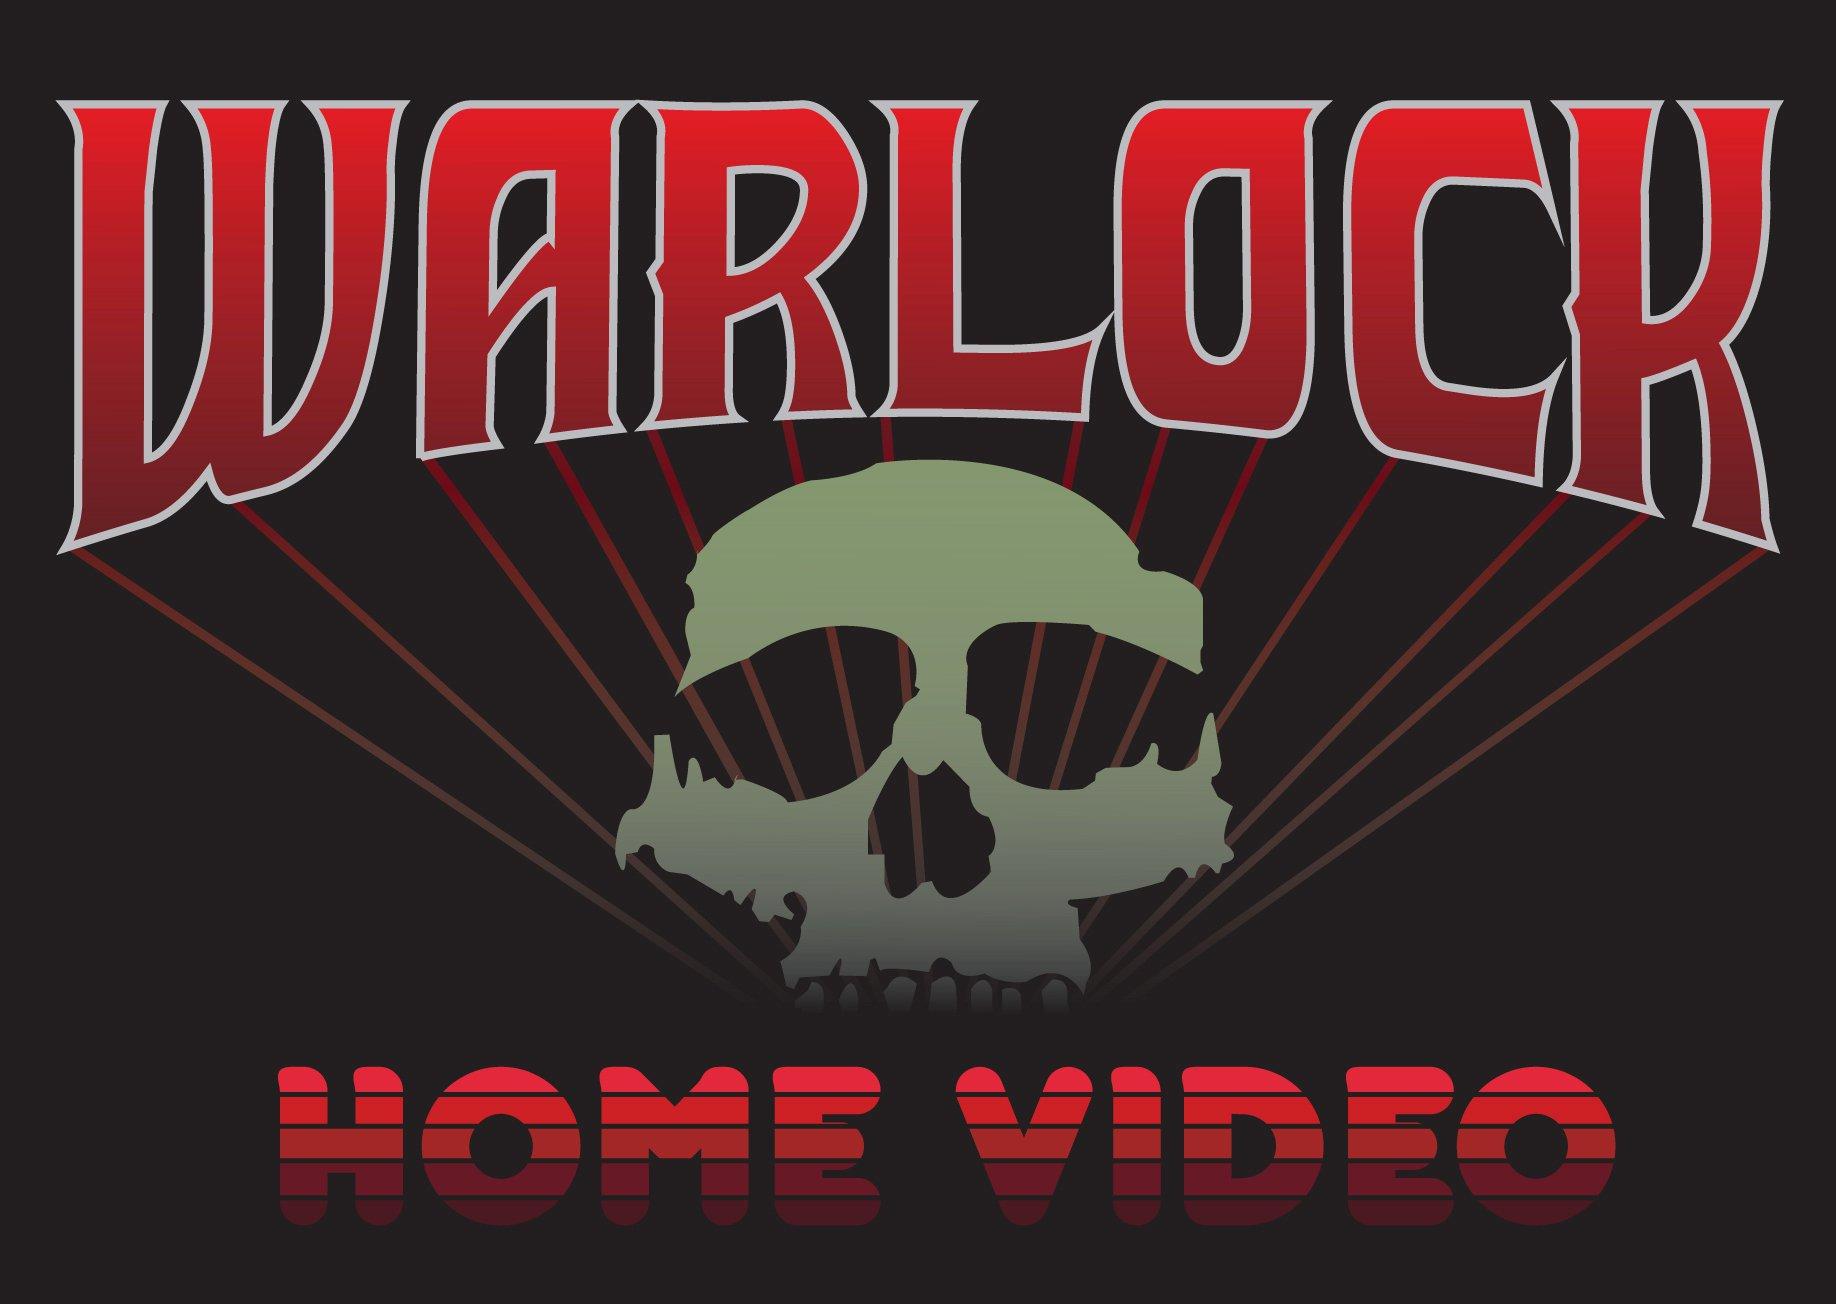 Warlockk